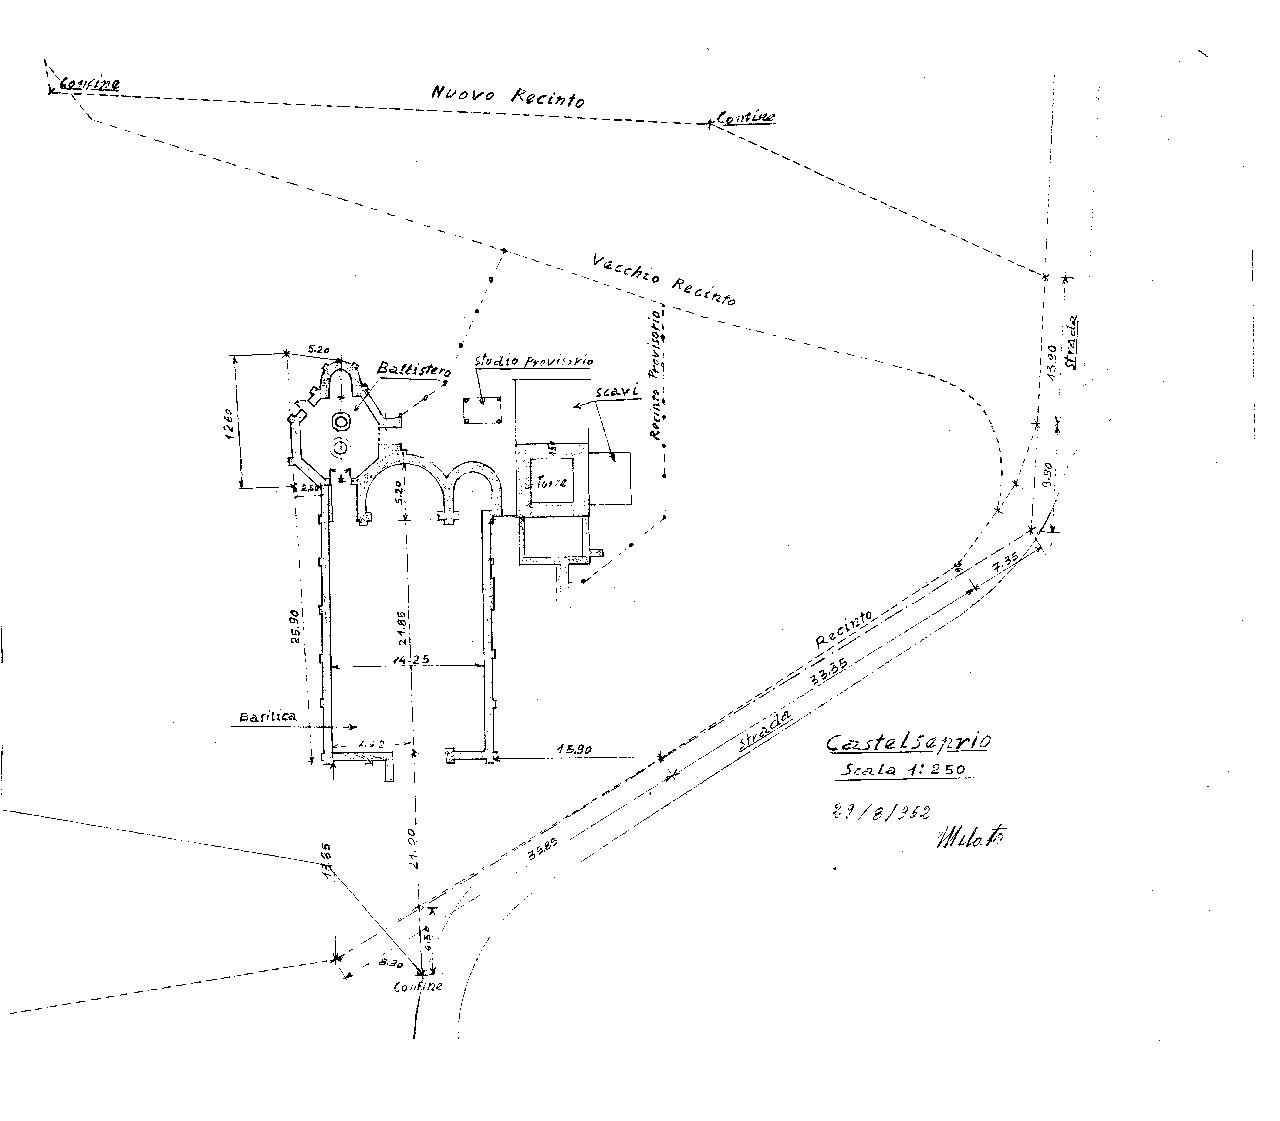 Rilievo area basilicale - Melato 1962